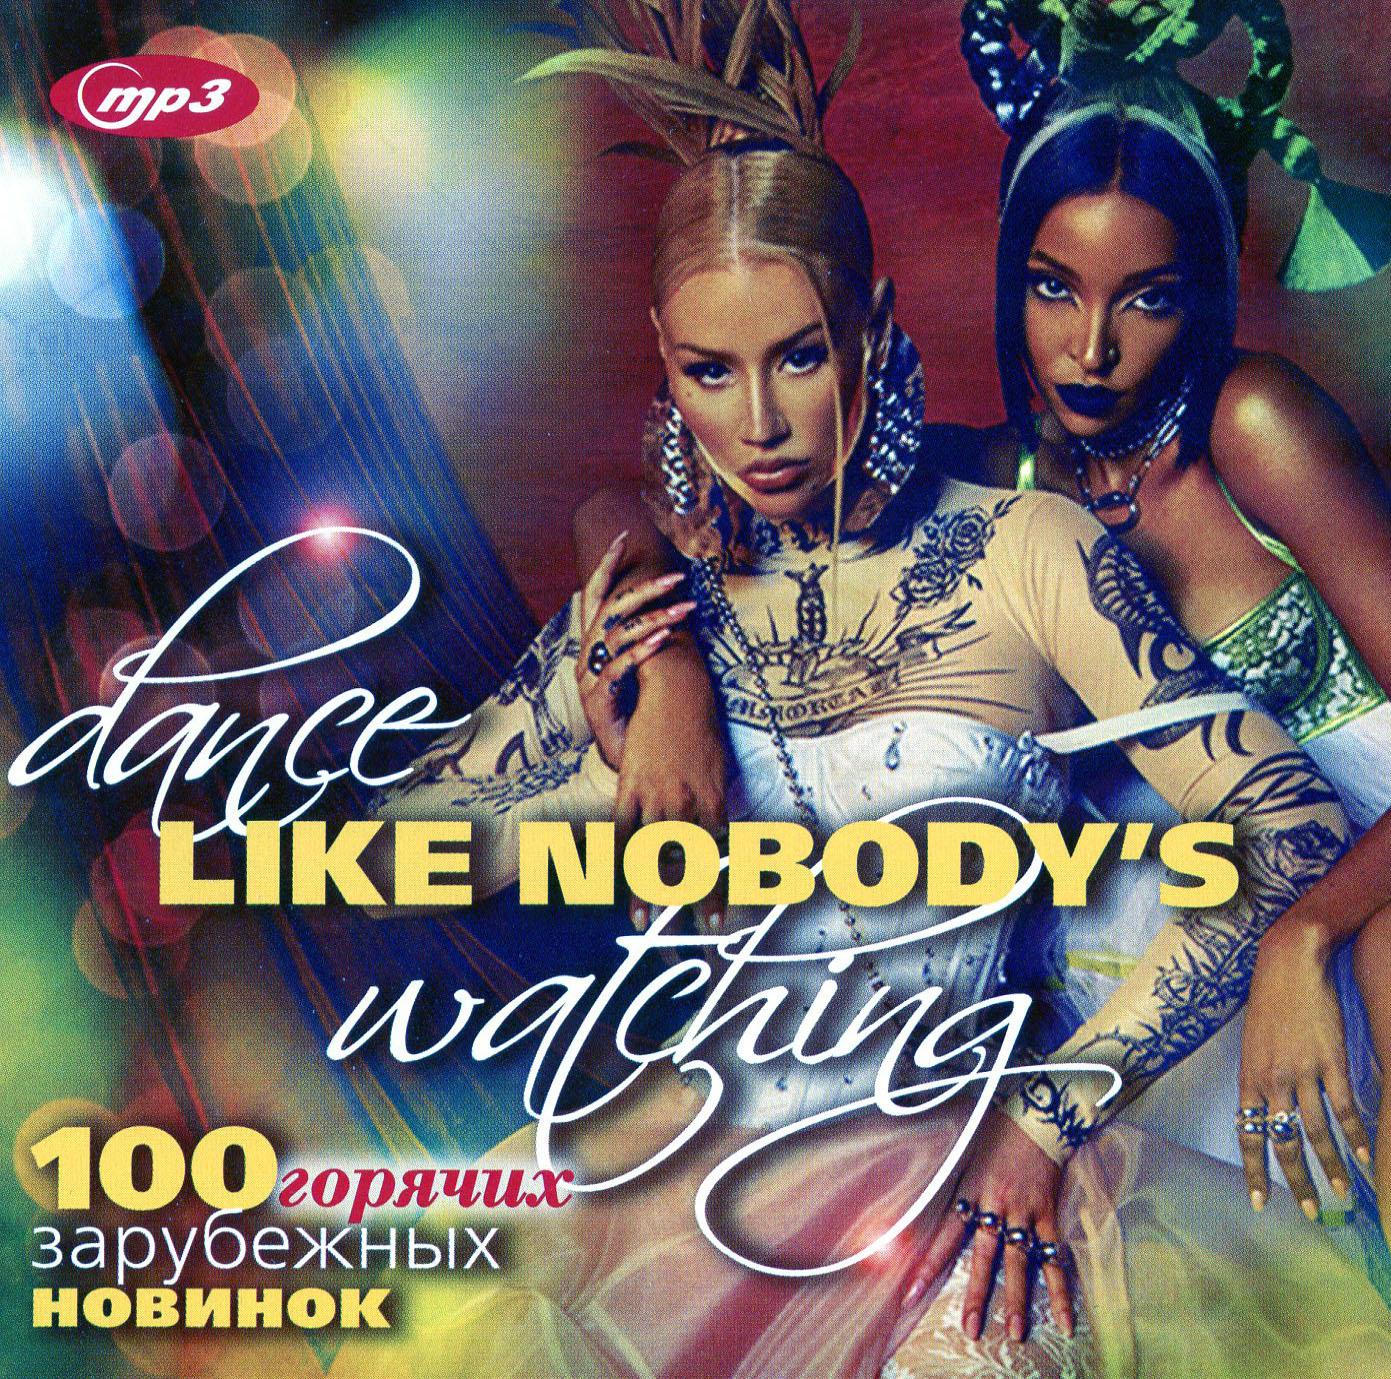 DANCE LIKE NOBODY'S WATCHING - 100 горячих зарубежных новинок [mp3]